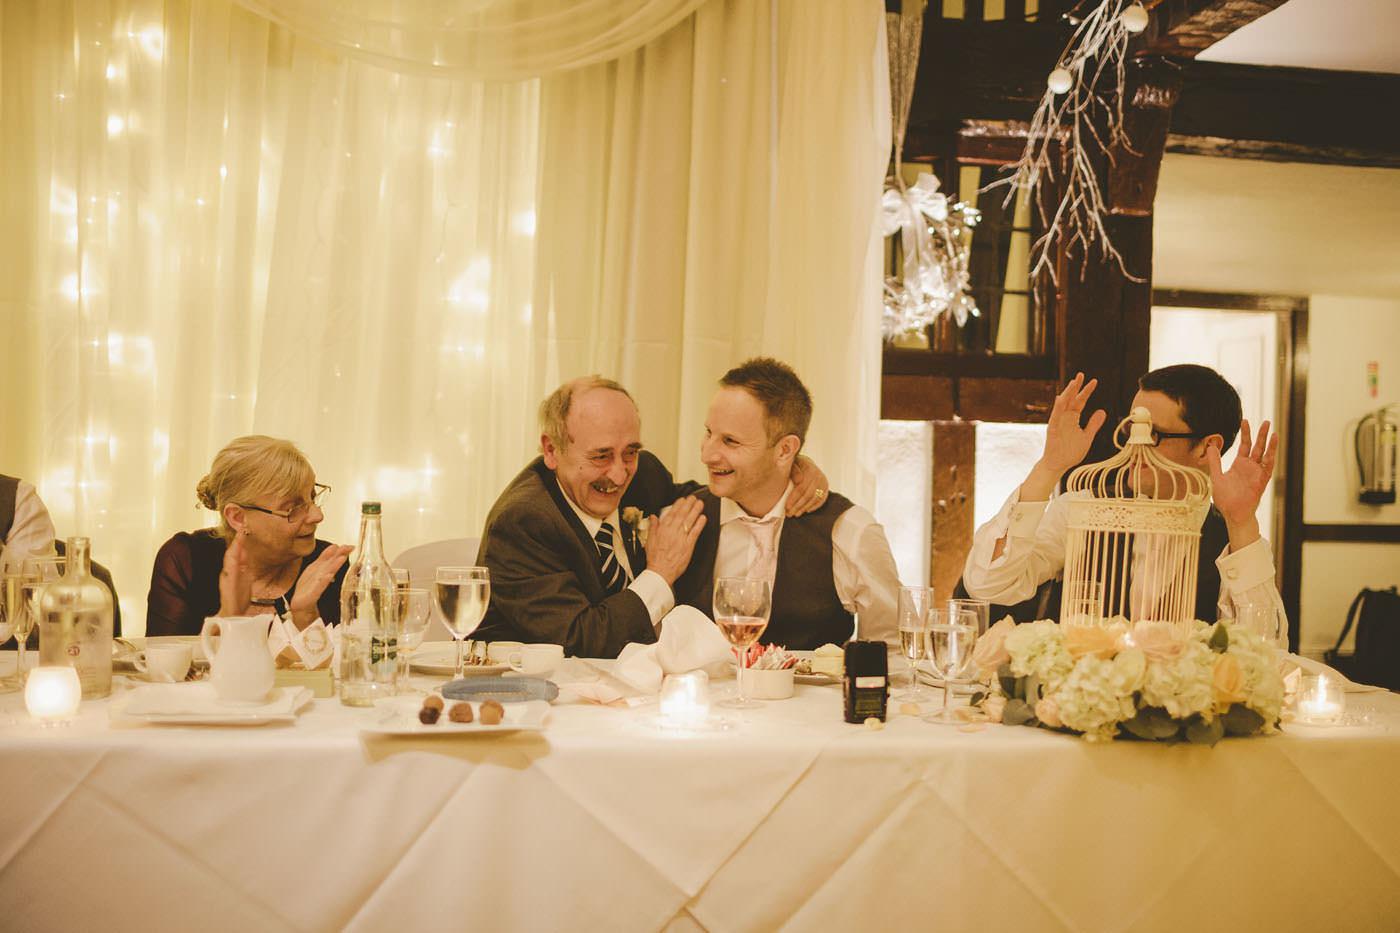 edmundjasveen burford bridge hotel wedding photographer 0100